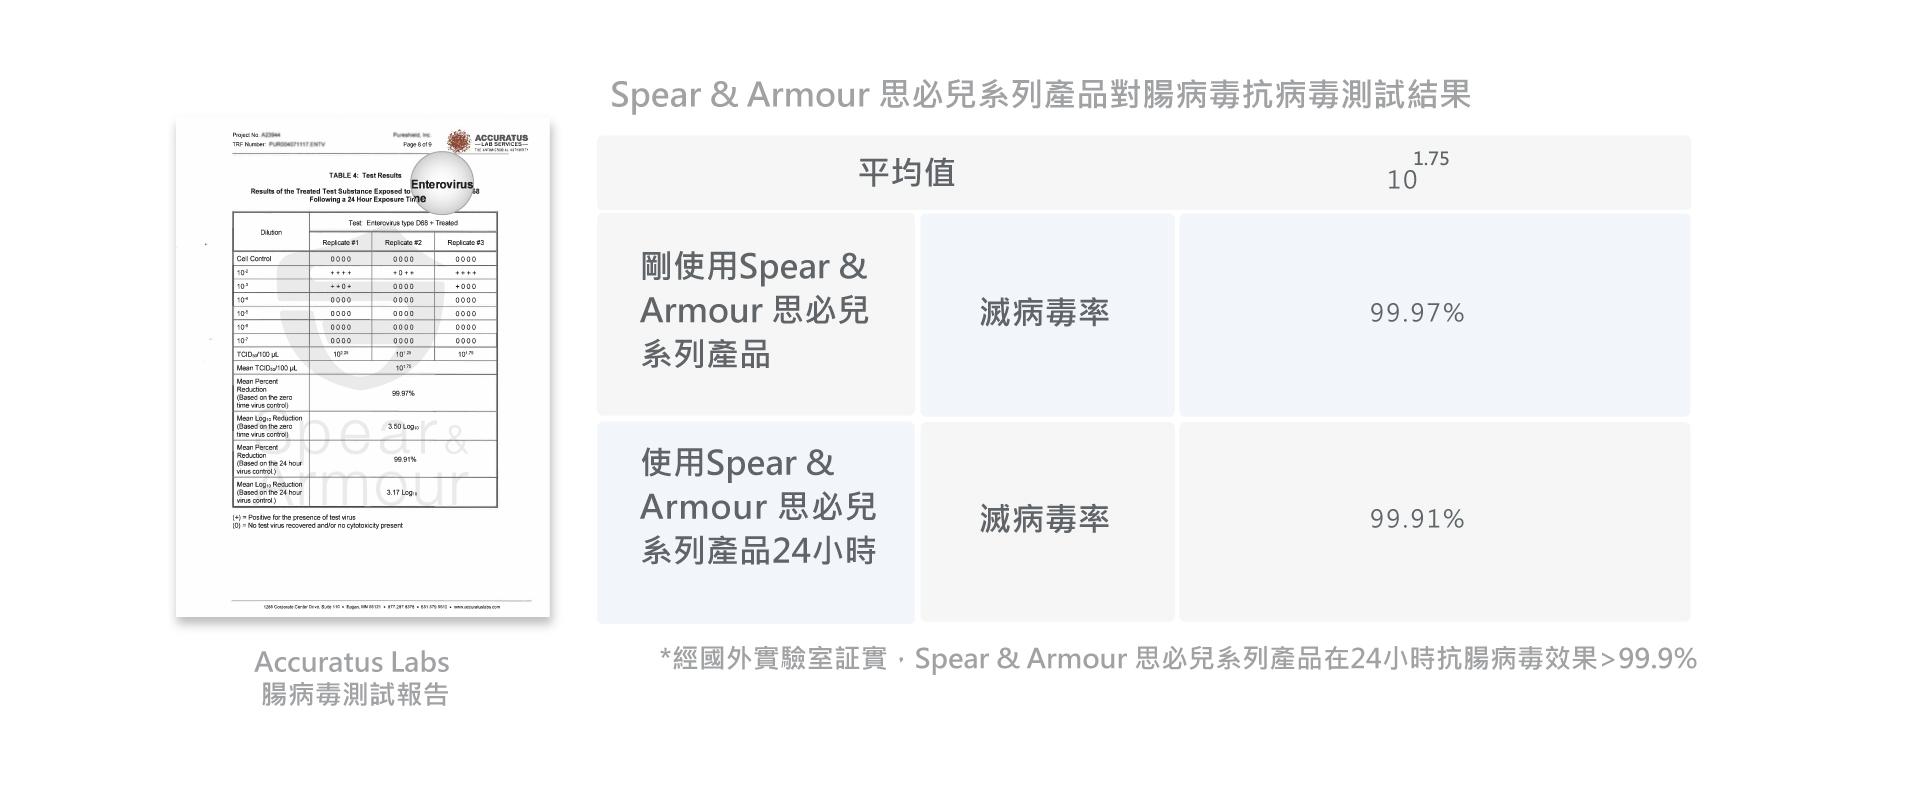 Spear & Armour 思必兒系列產品24小時抗腸病毒效果>99.9%